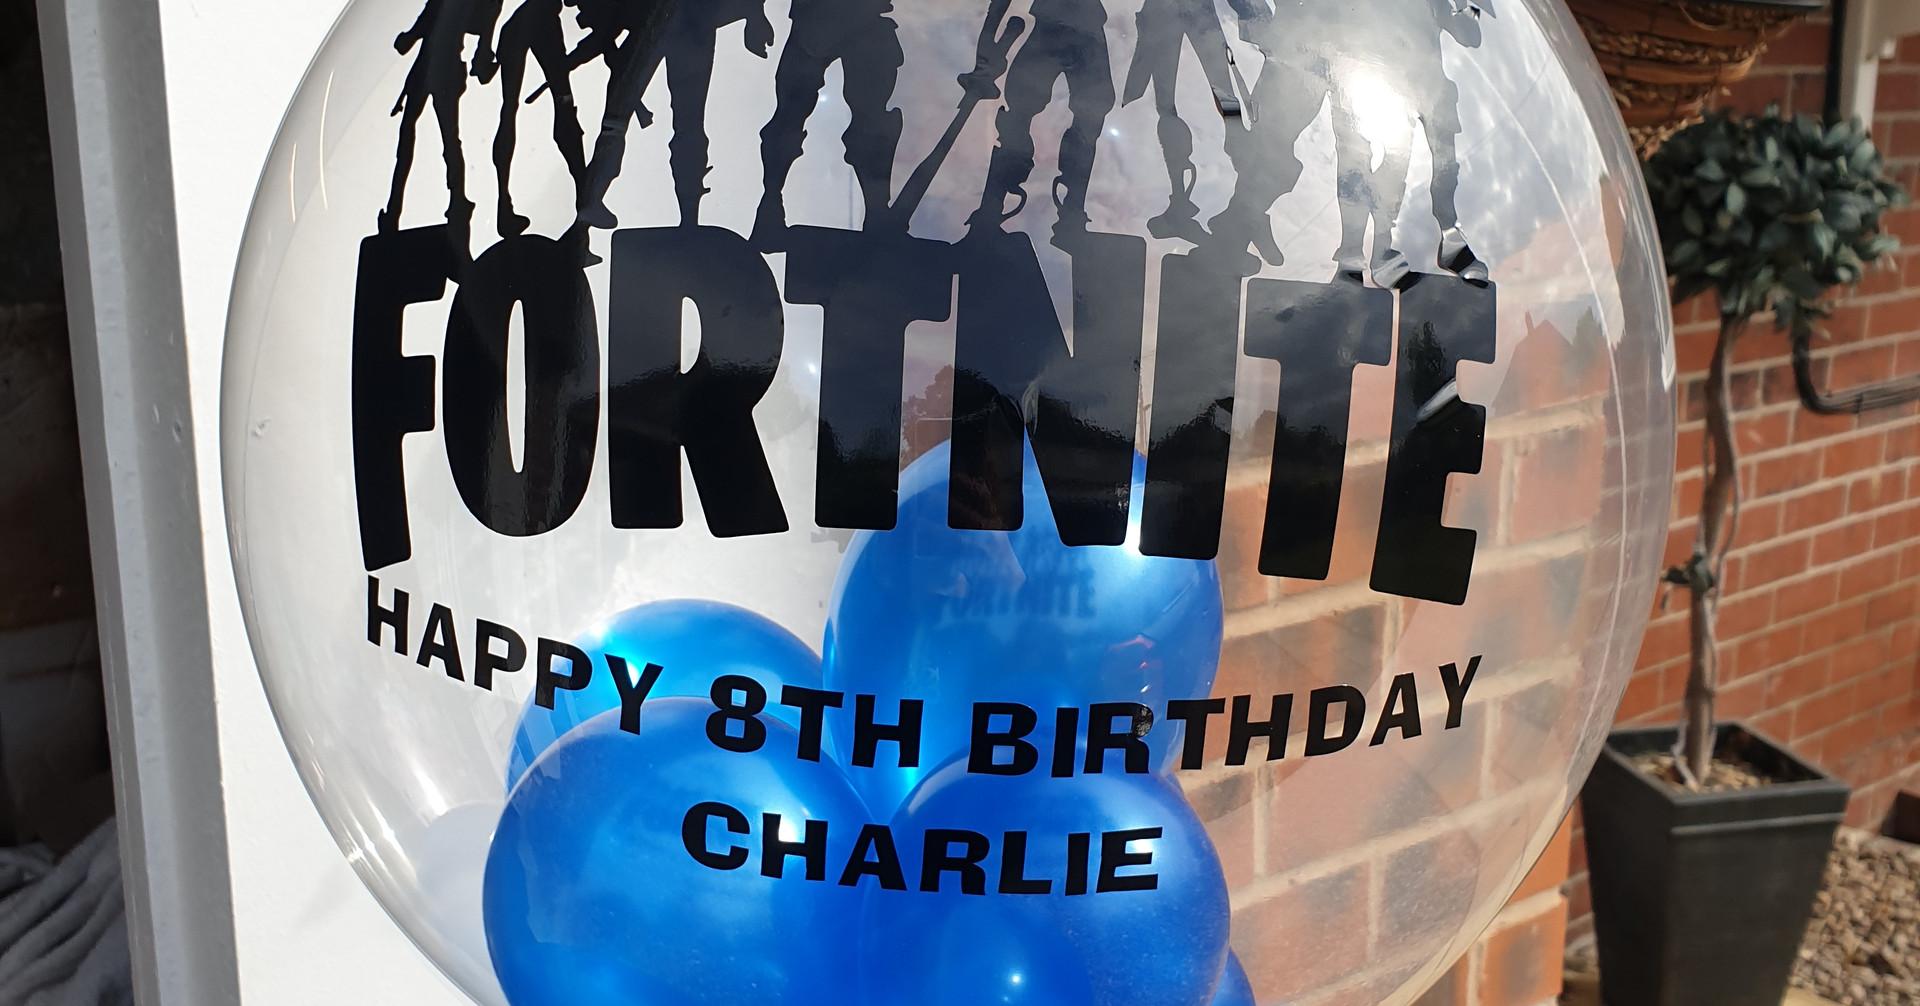 Fortnite birthday bubble balloon